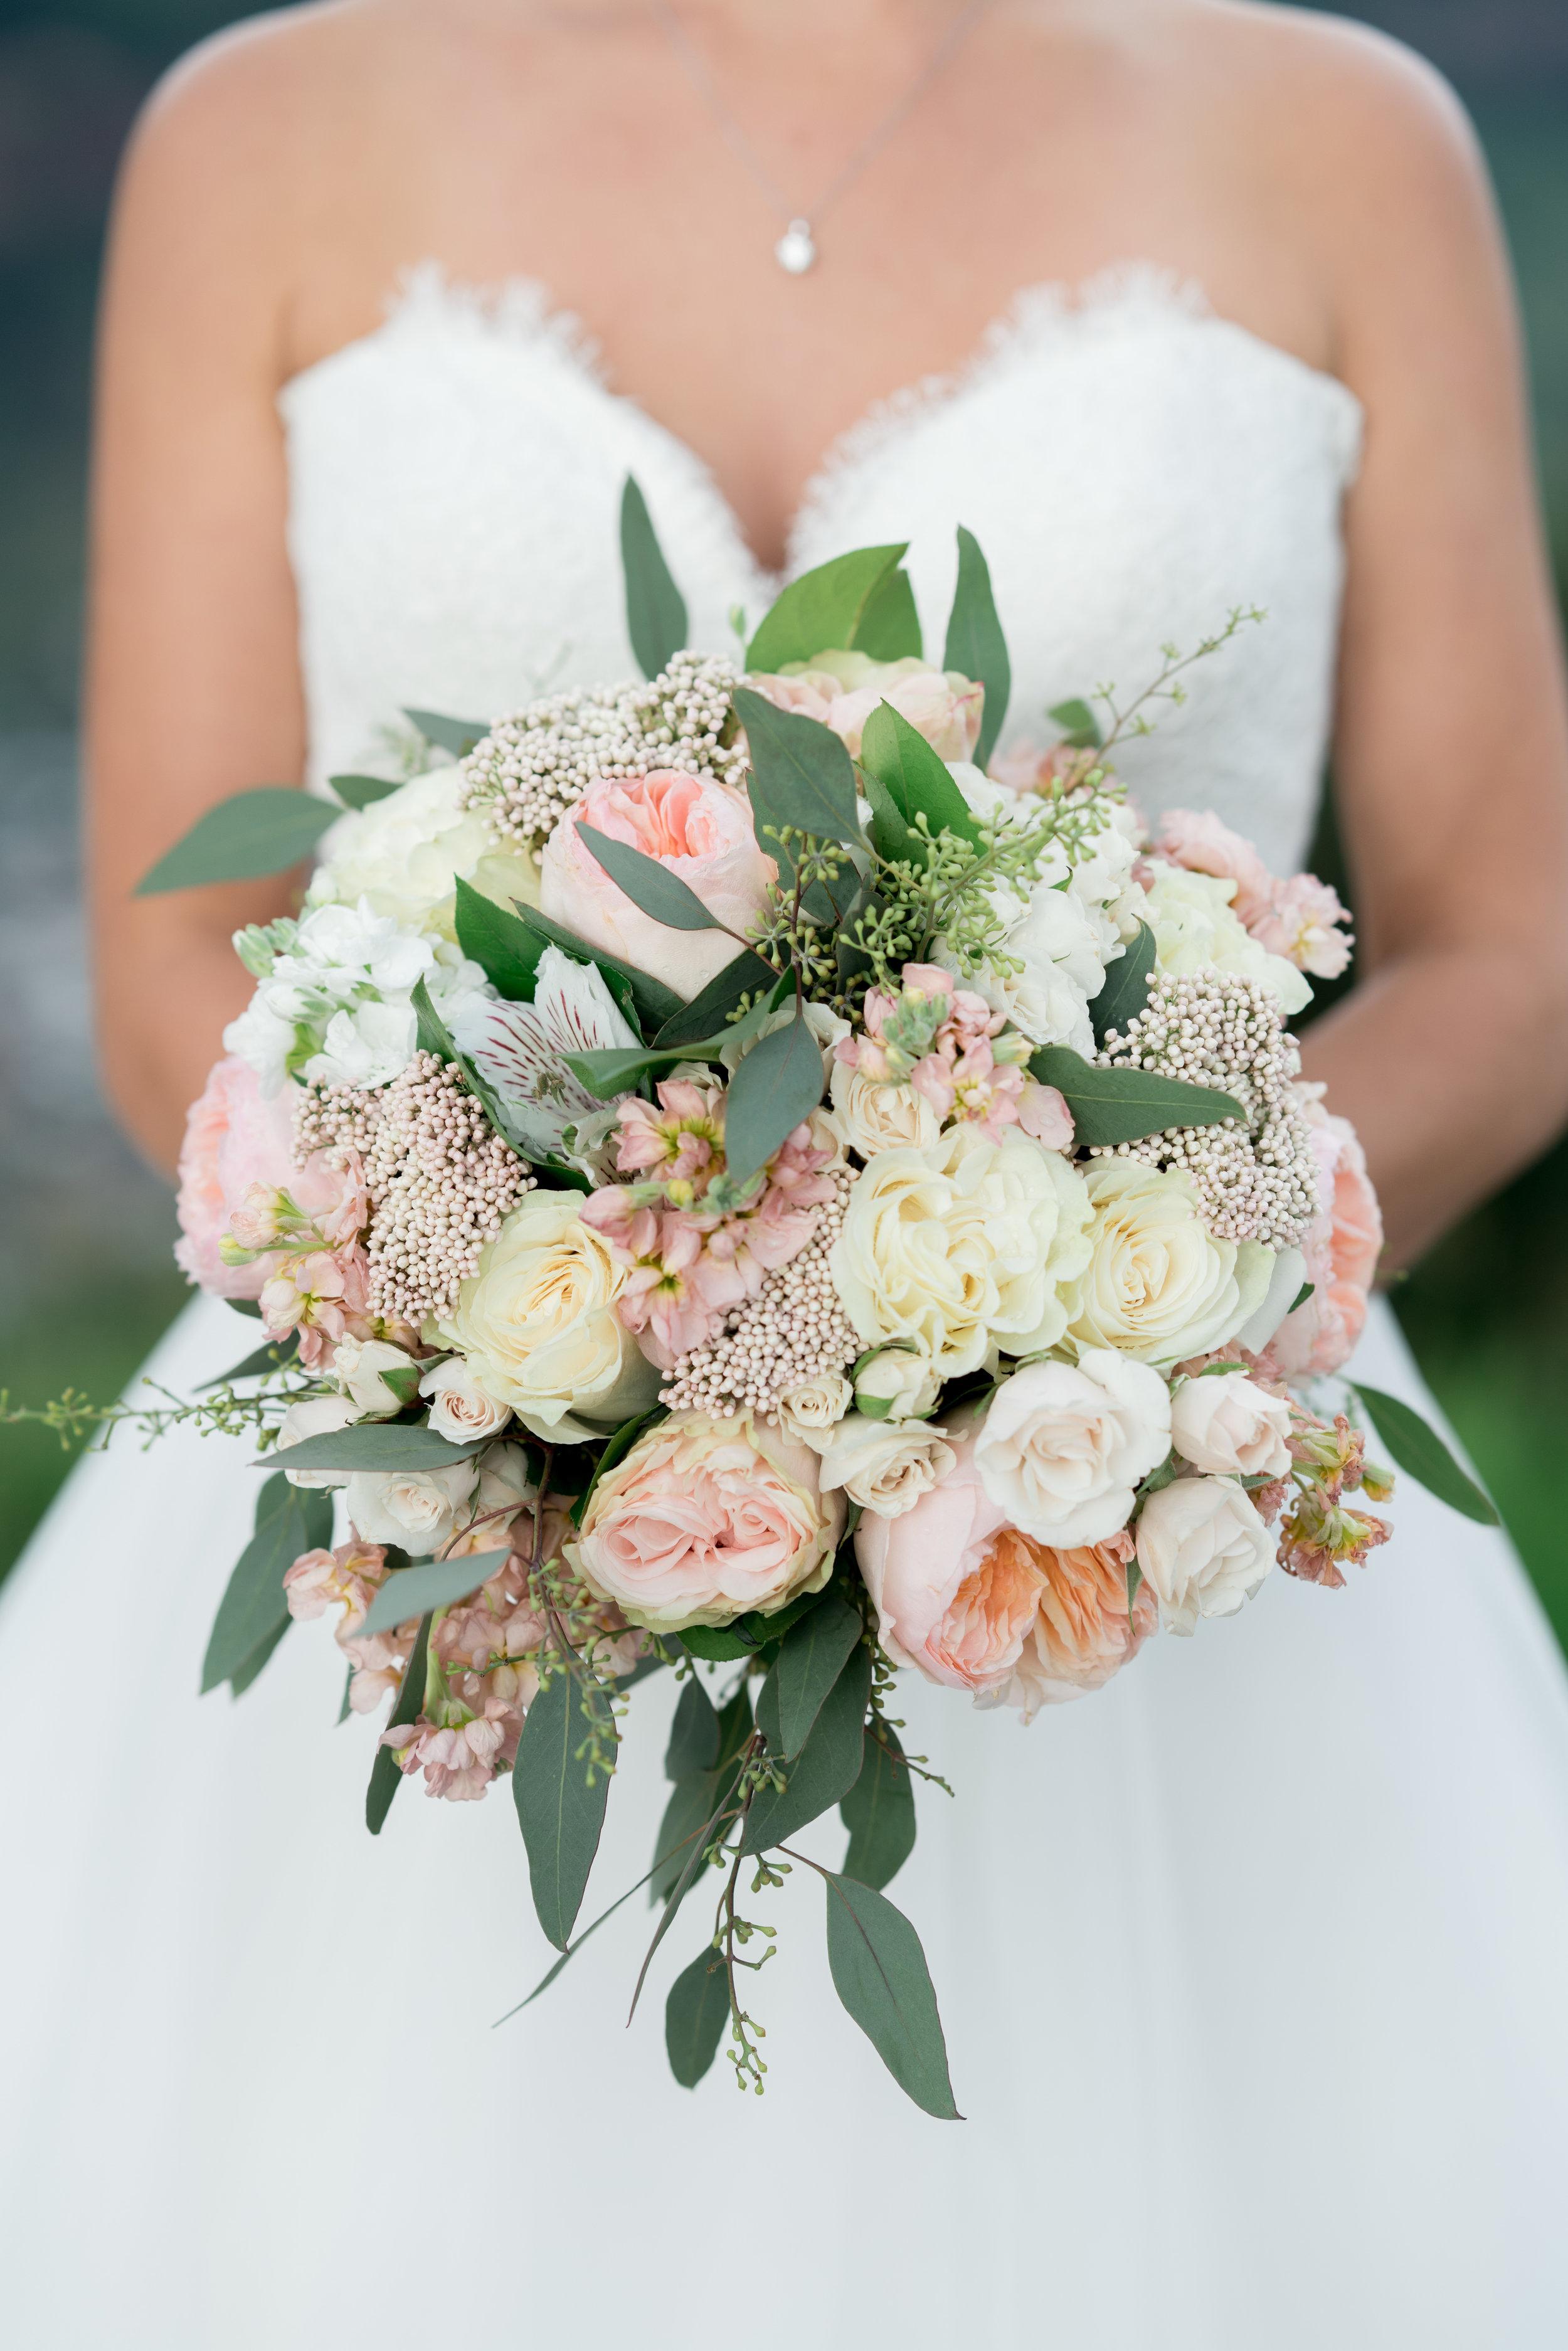 David Manning Photographer floral images